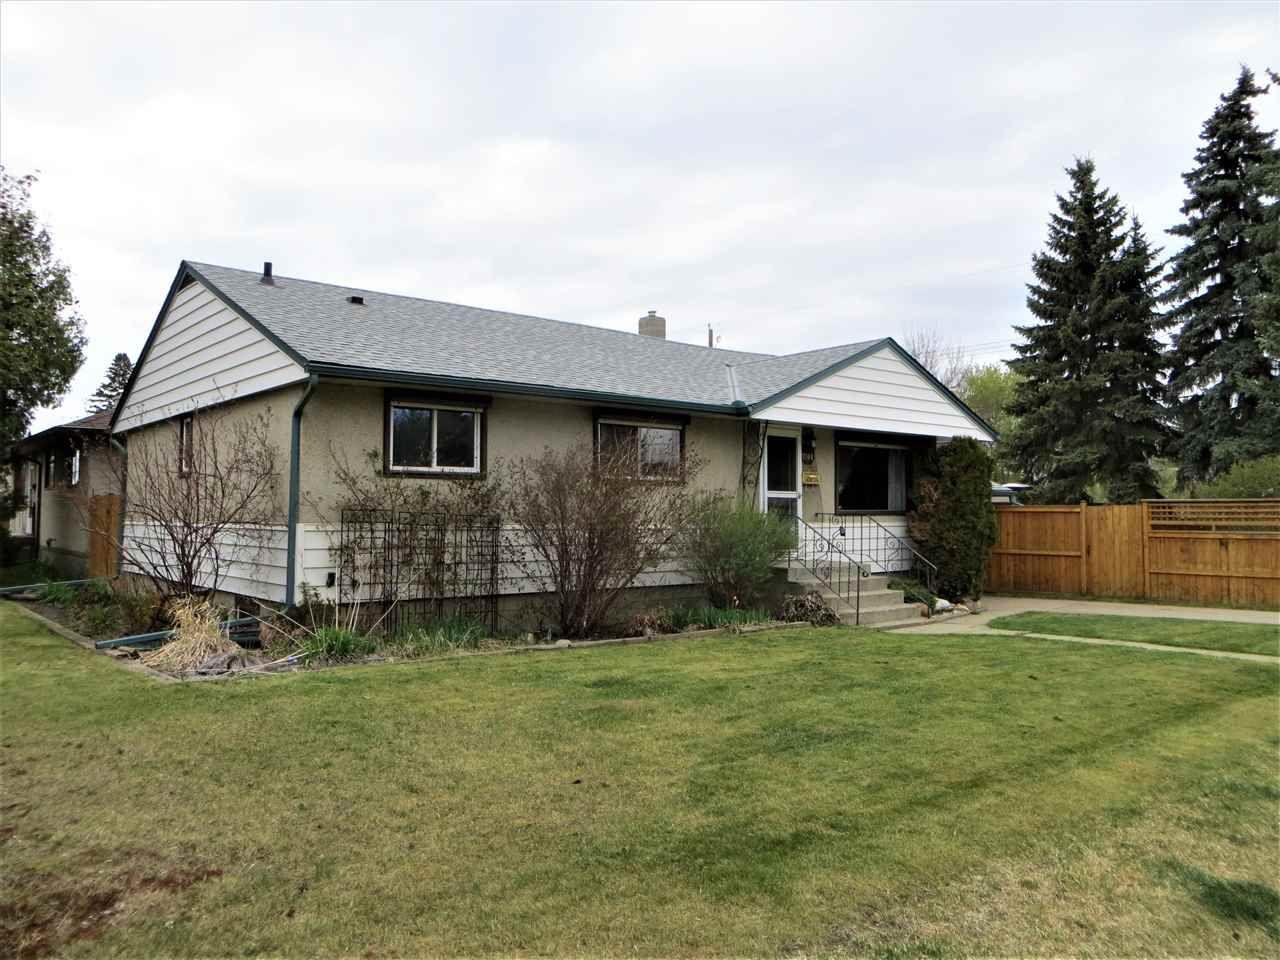 Main Photo: 7304 85 Street in Edmonton: Zone 17 House for sale : MLS®# E4156943